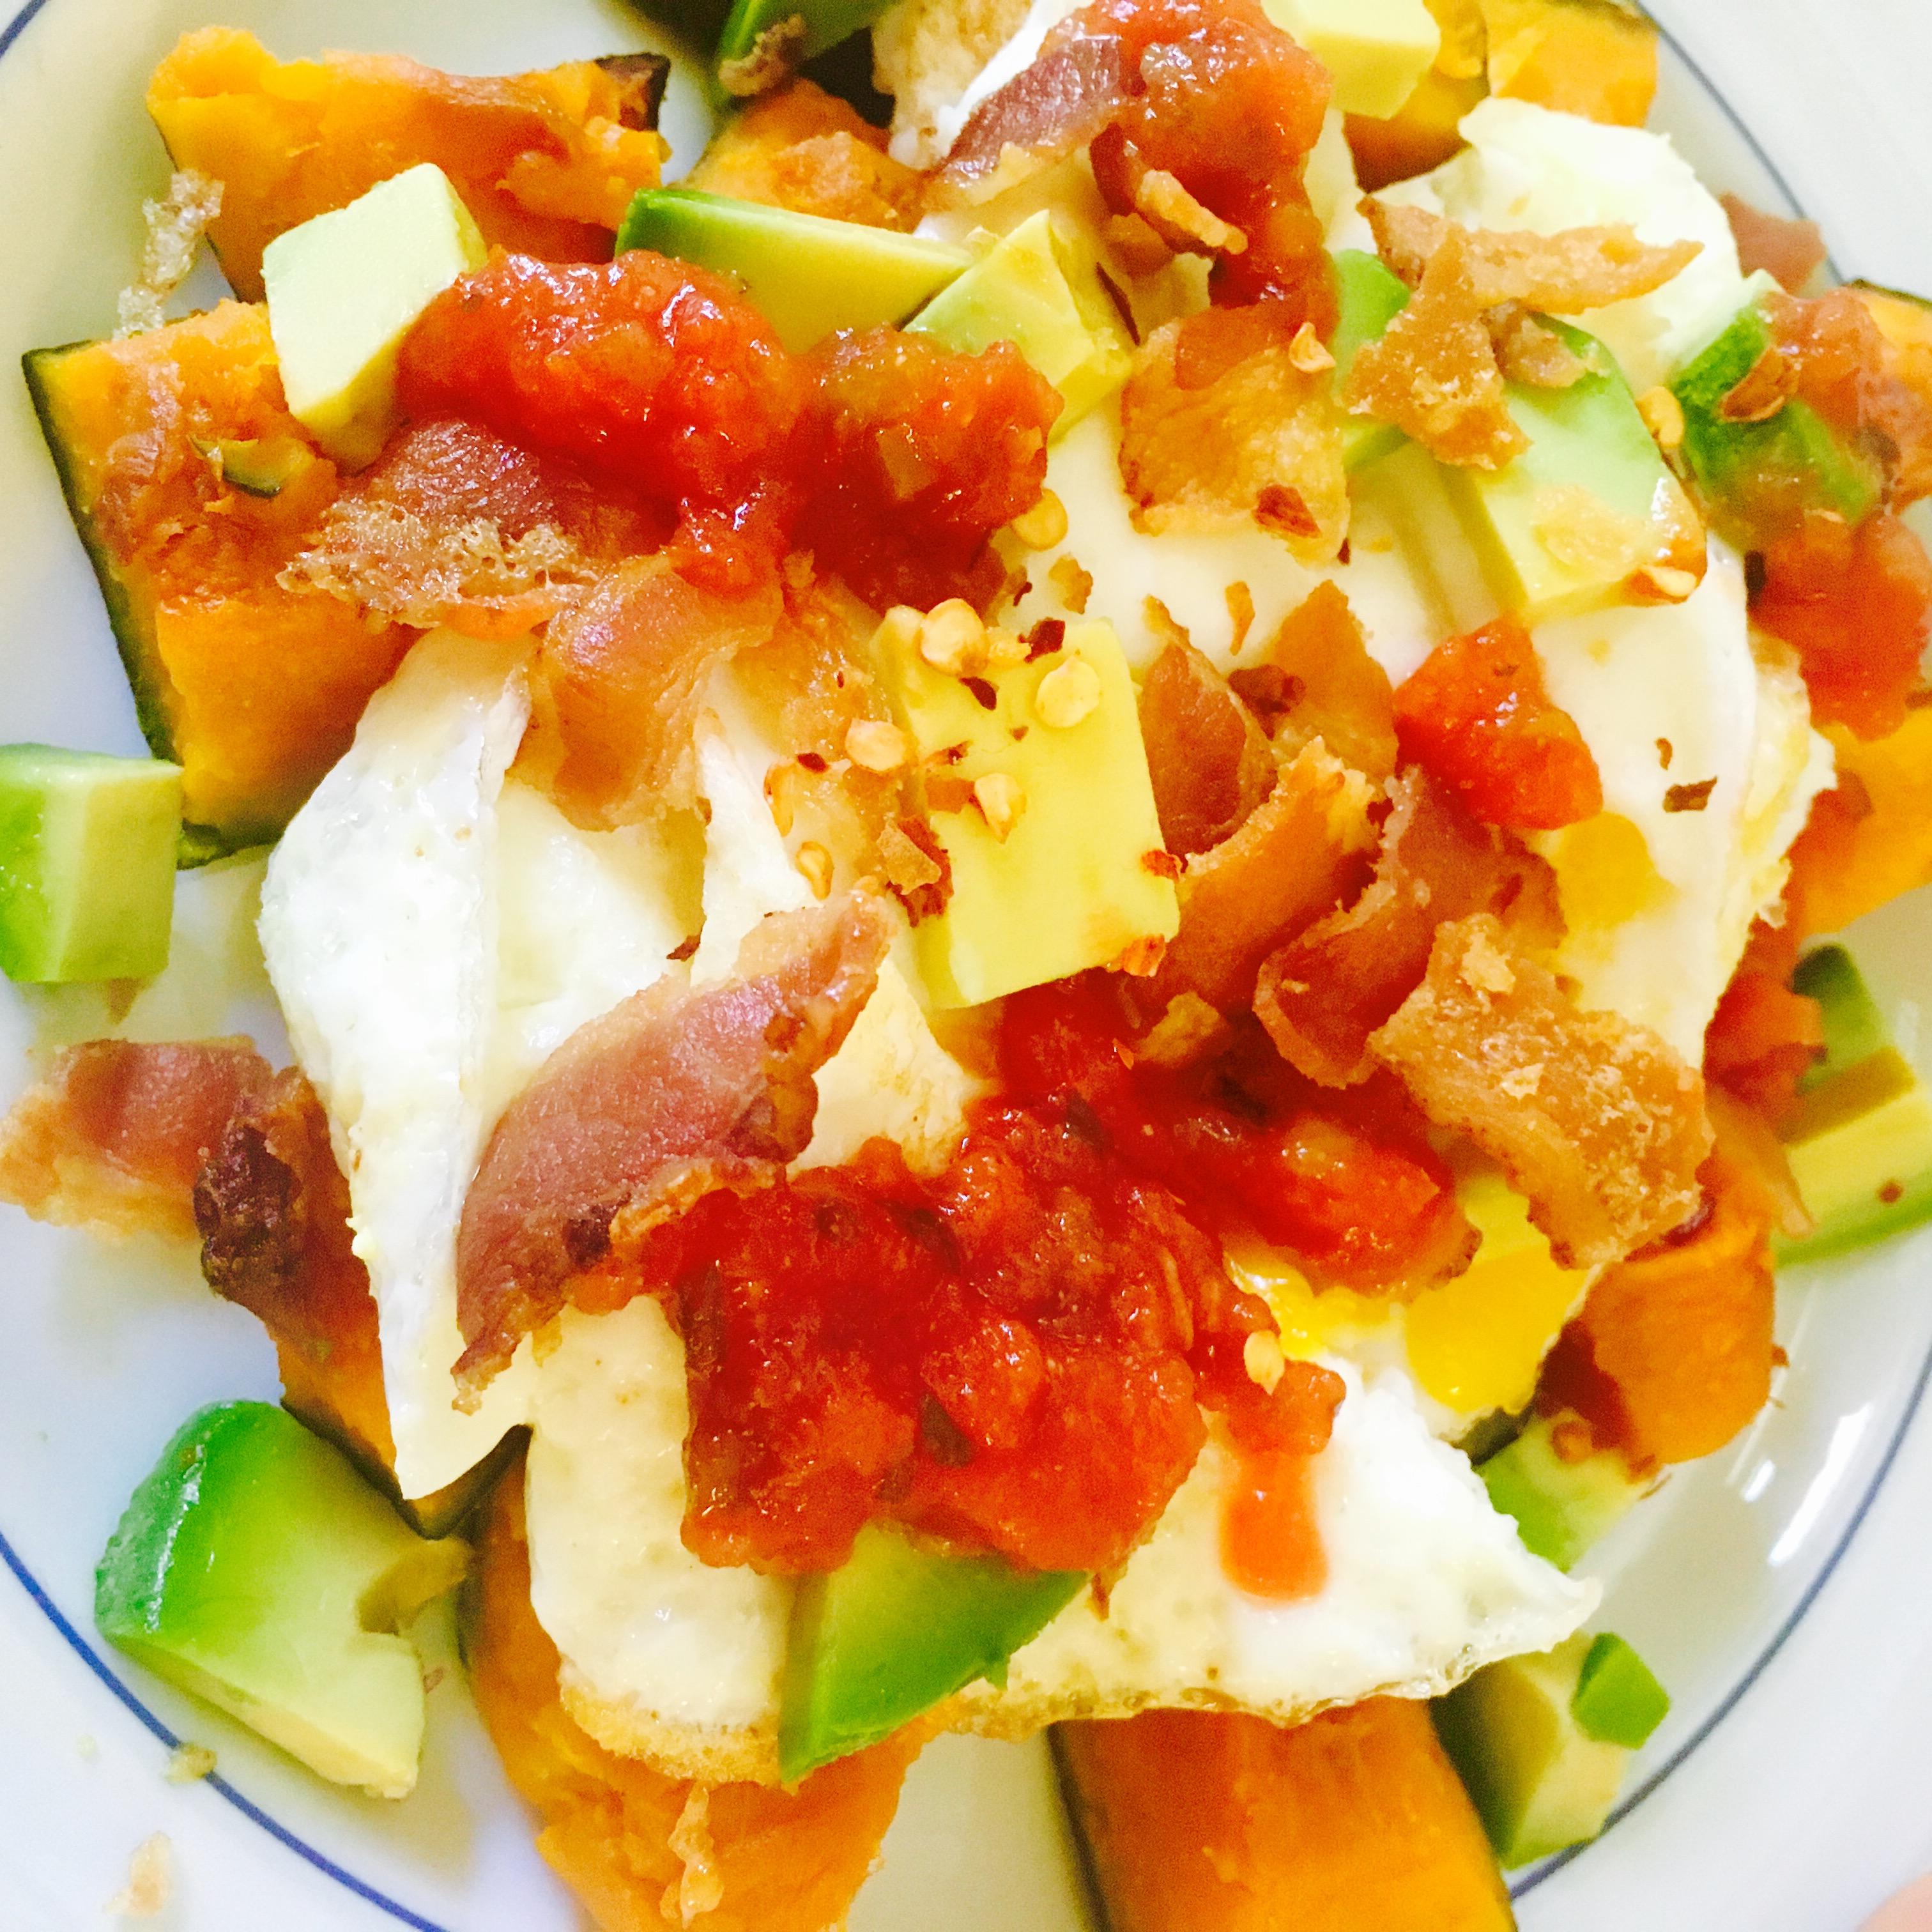 Breakfast Kabocha and Eggs